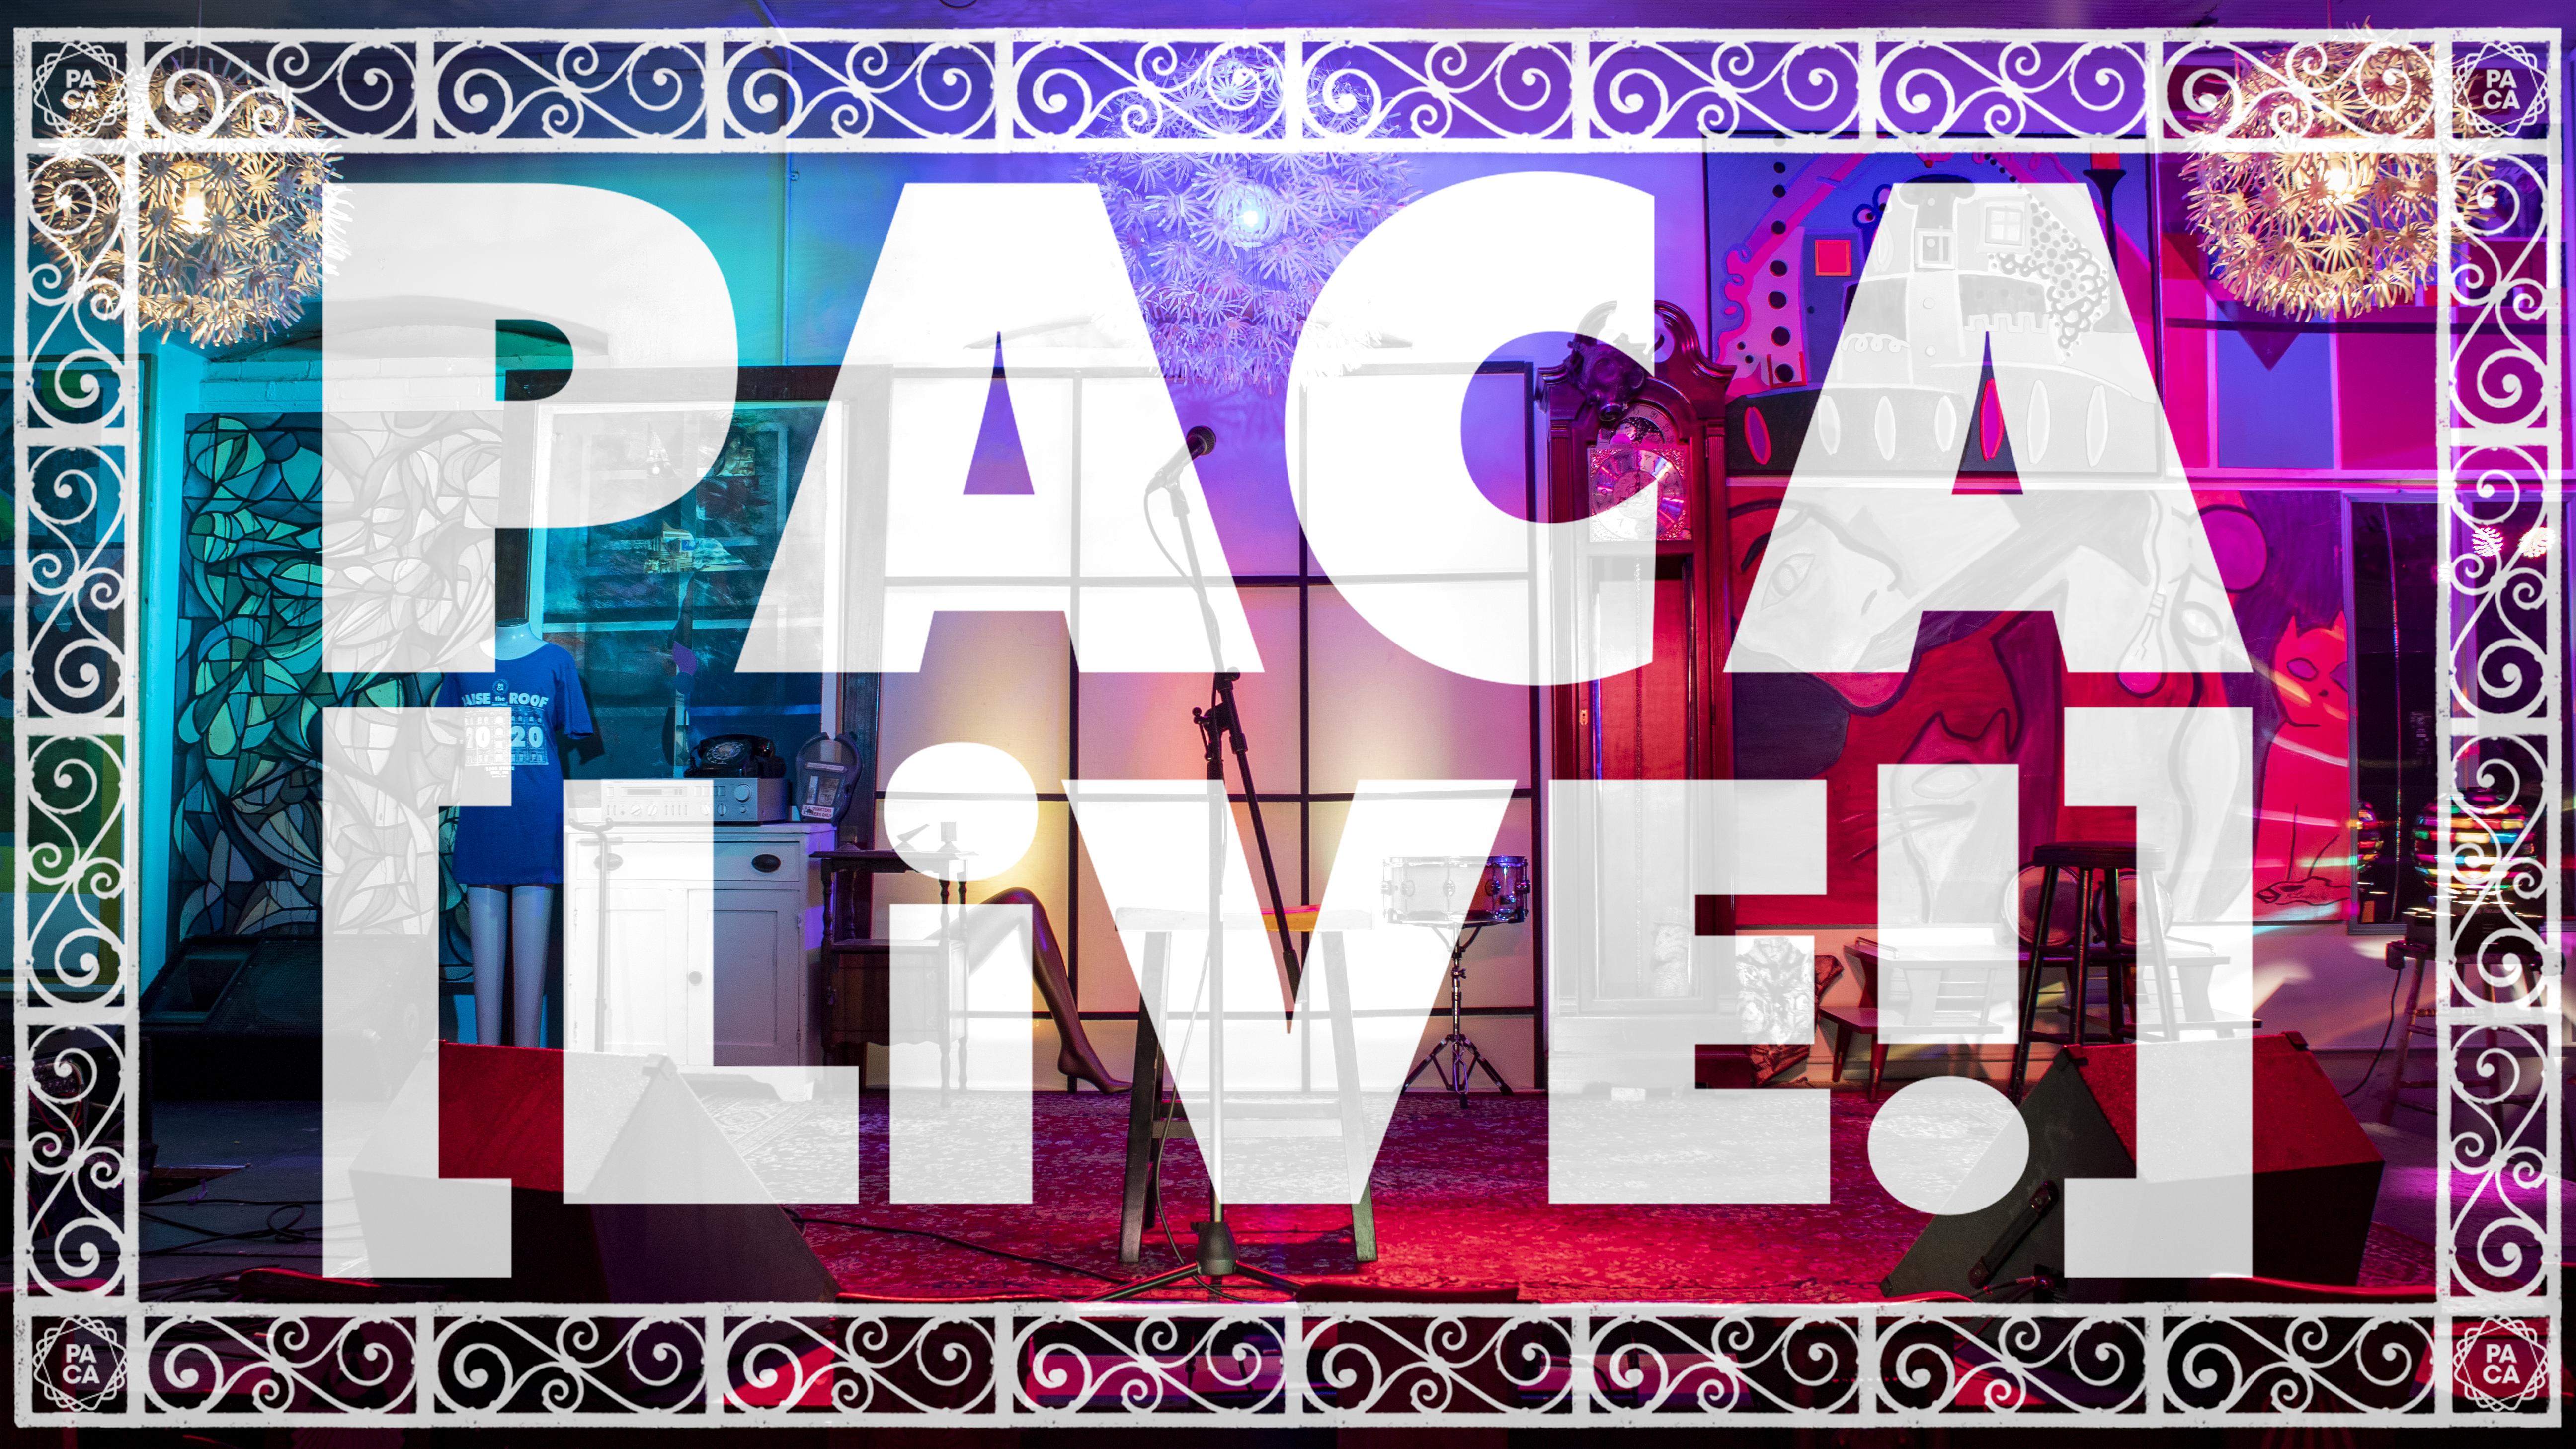 PACA [LiVE!] Concert Series